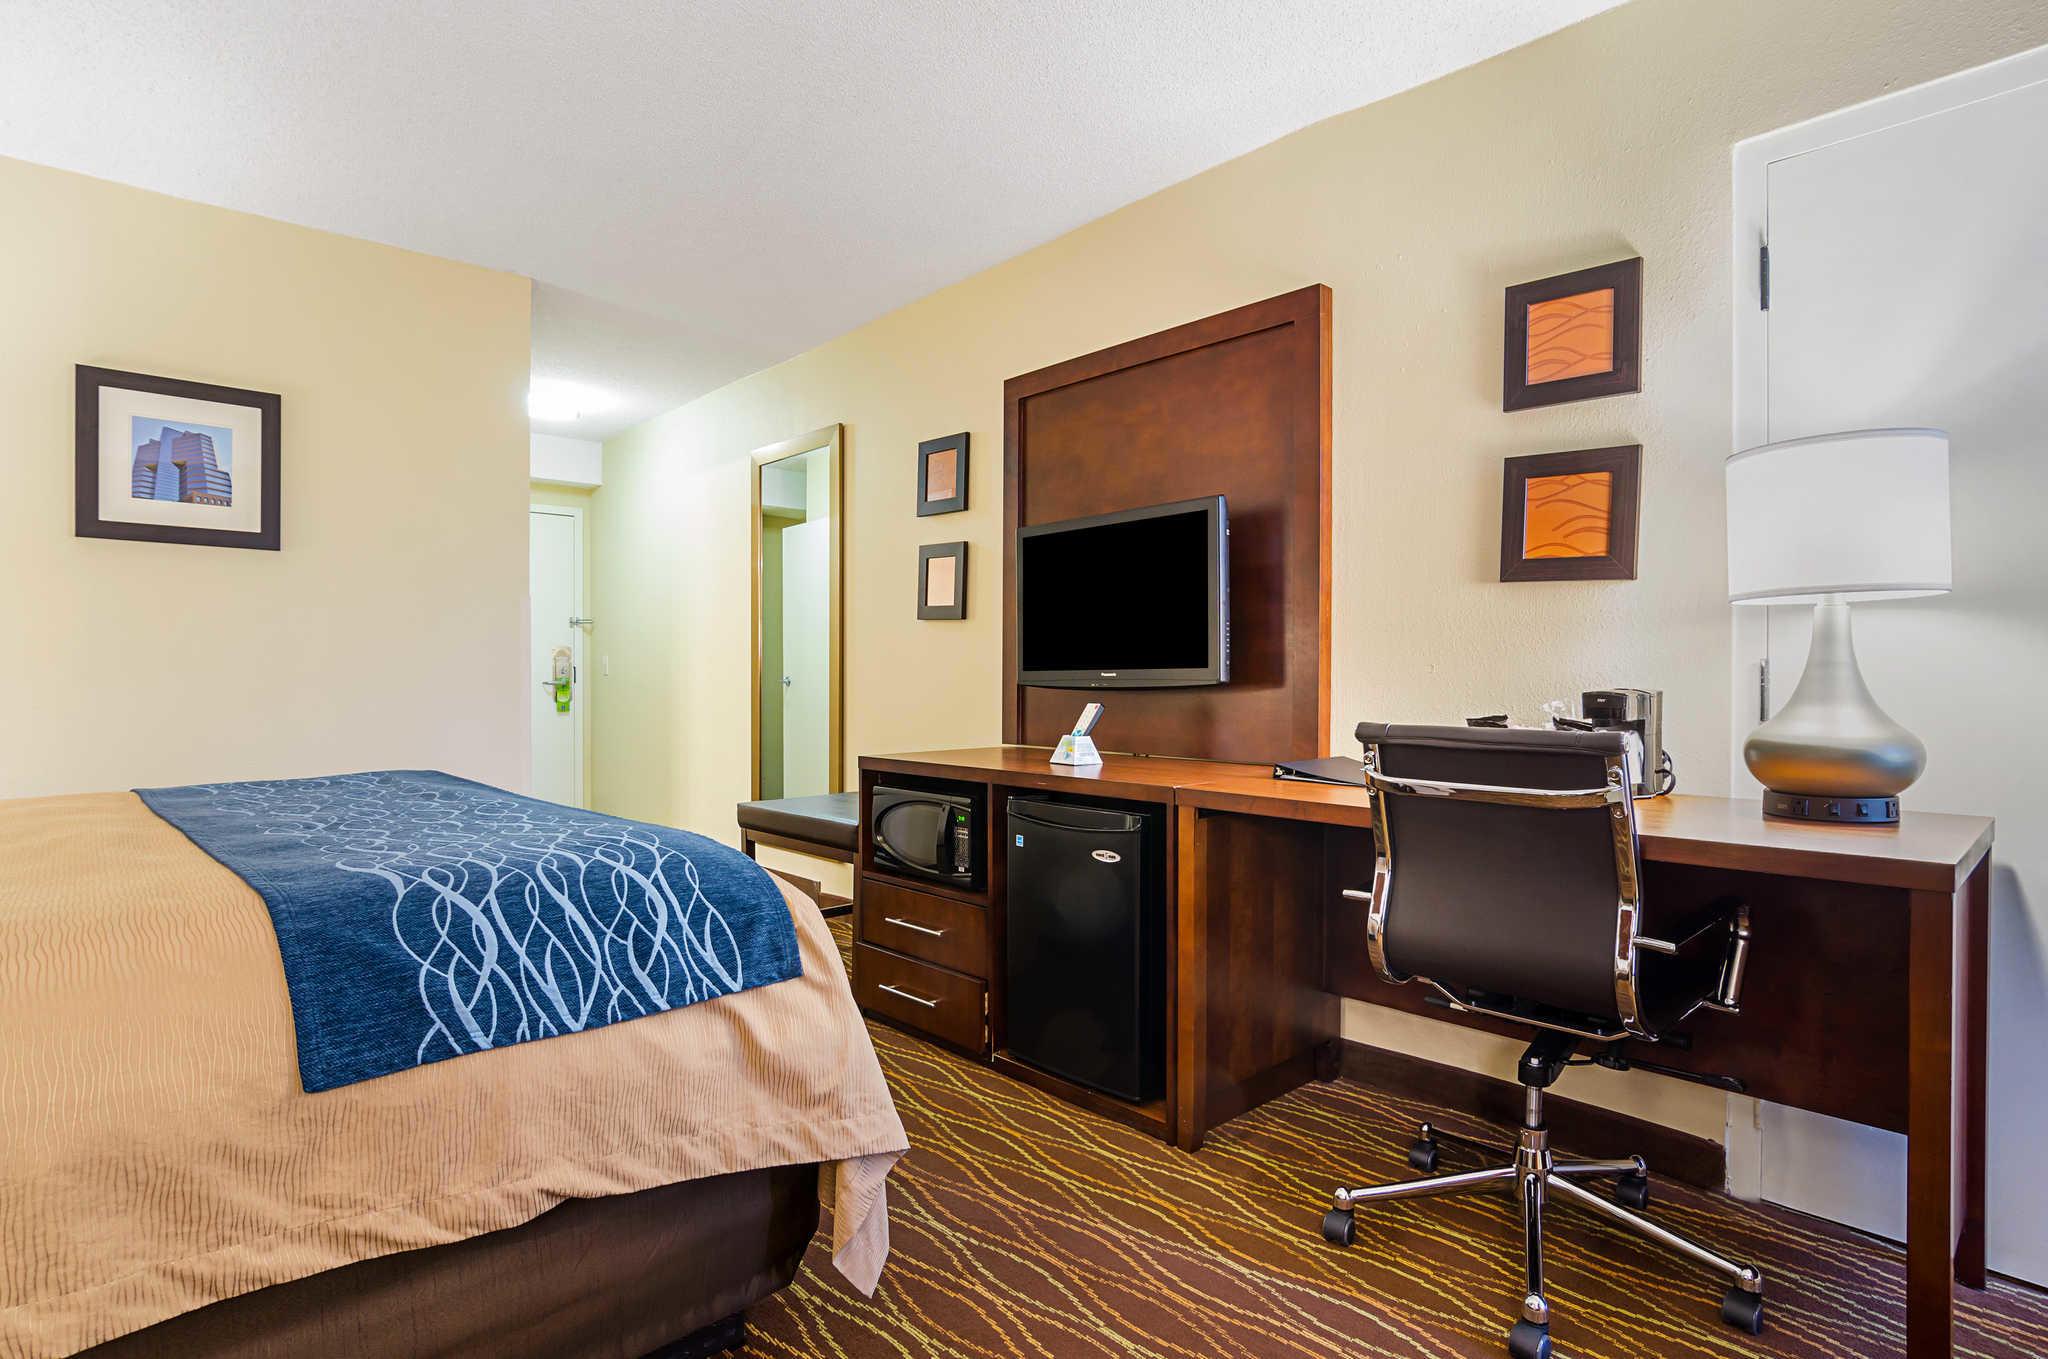 Comfort Inn & Suites Duke University-Downtown image 8